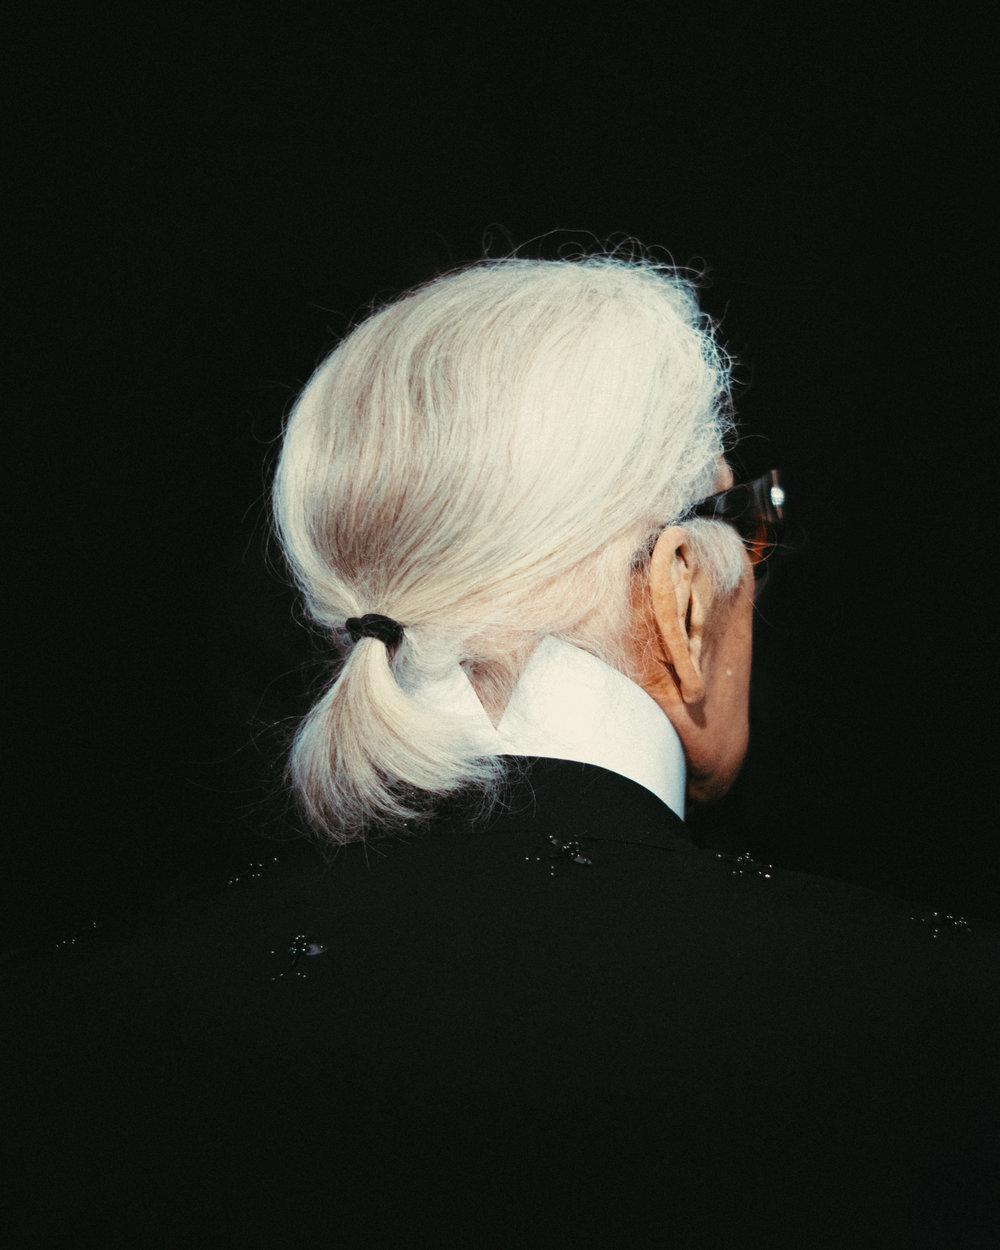 Karl Lagerfeld, 2018